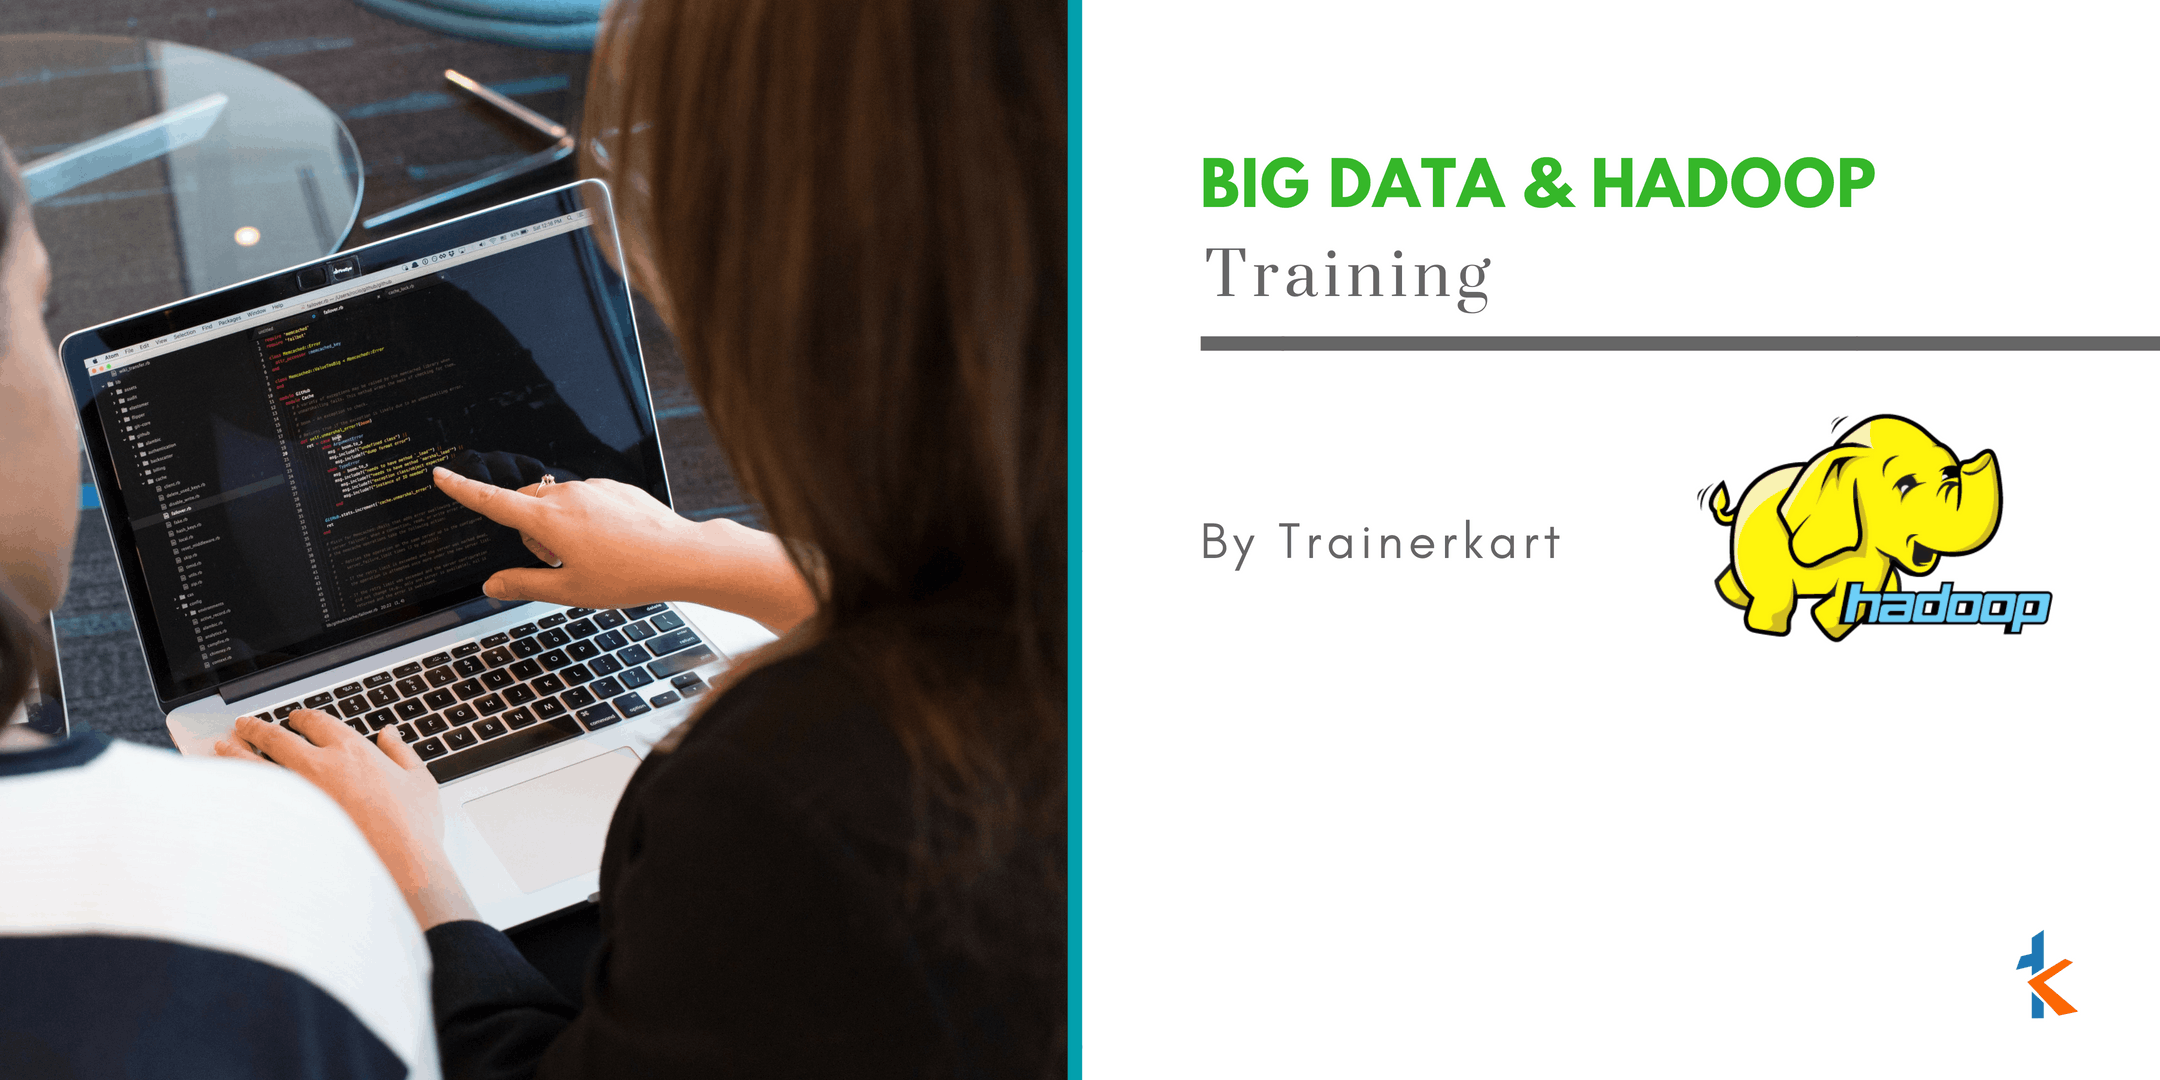 Big Data and Hadoop Classroom Training in Por